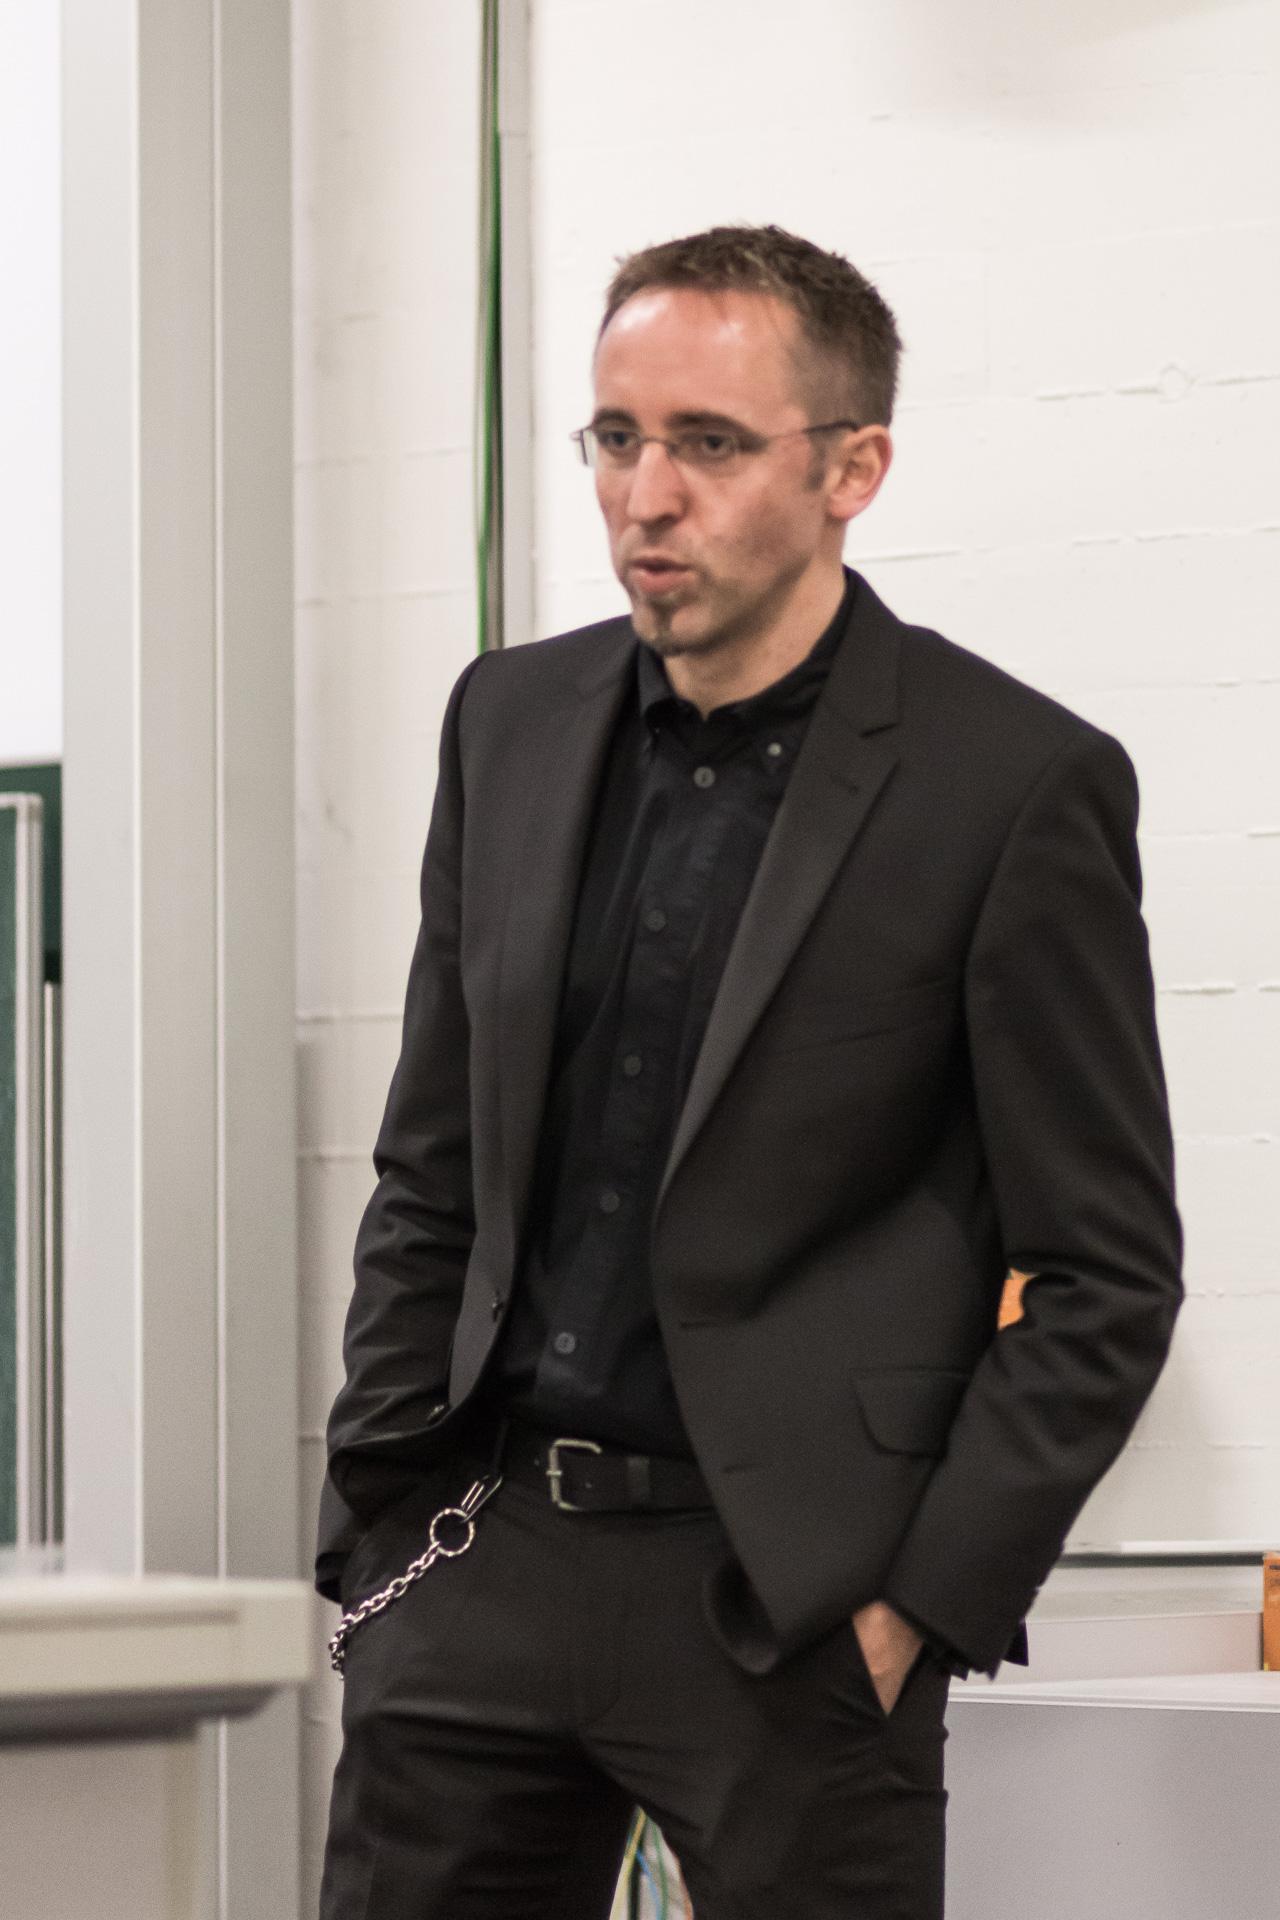 Sven Adam ist Rechtsanwalt in Göttingen. Sein Spezialgebiet sind Fälle von Racial Profiling.